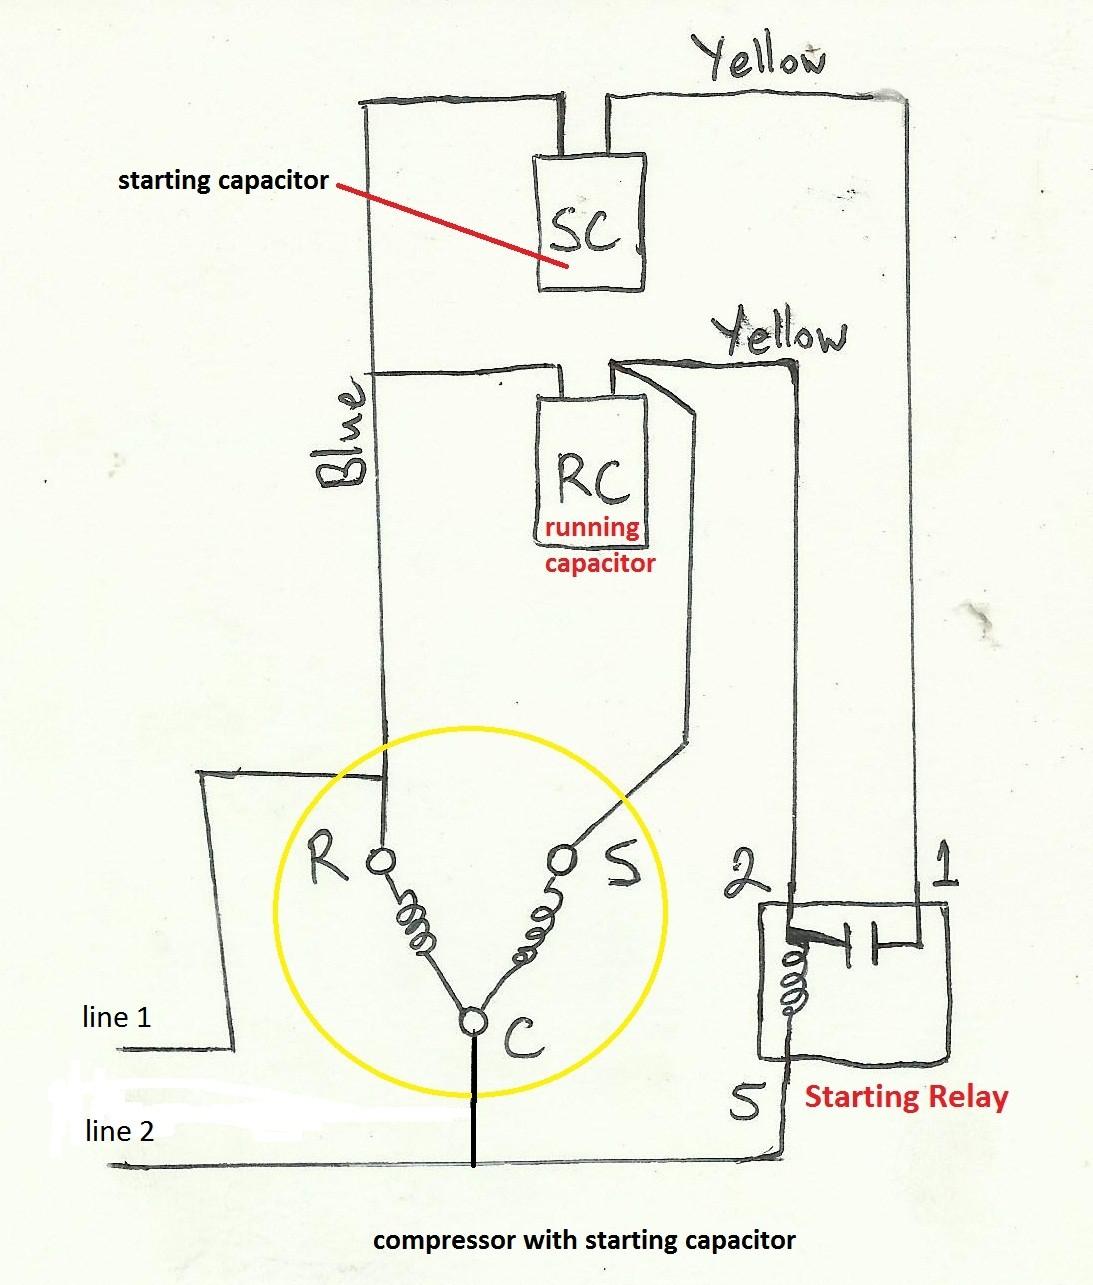 Elegant Window Ac Wiring Diagram 42 Leviton 3 Way Switch Wiring Diagram with Window Ac